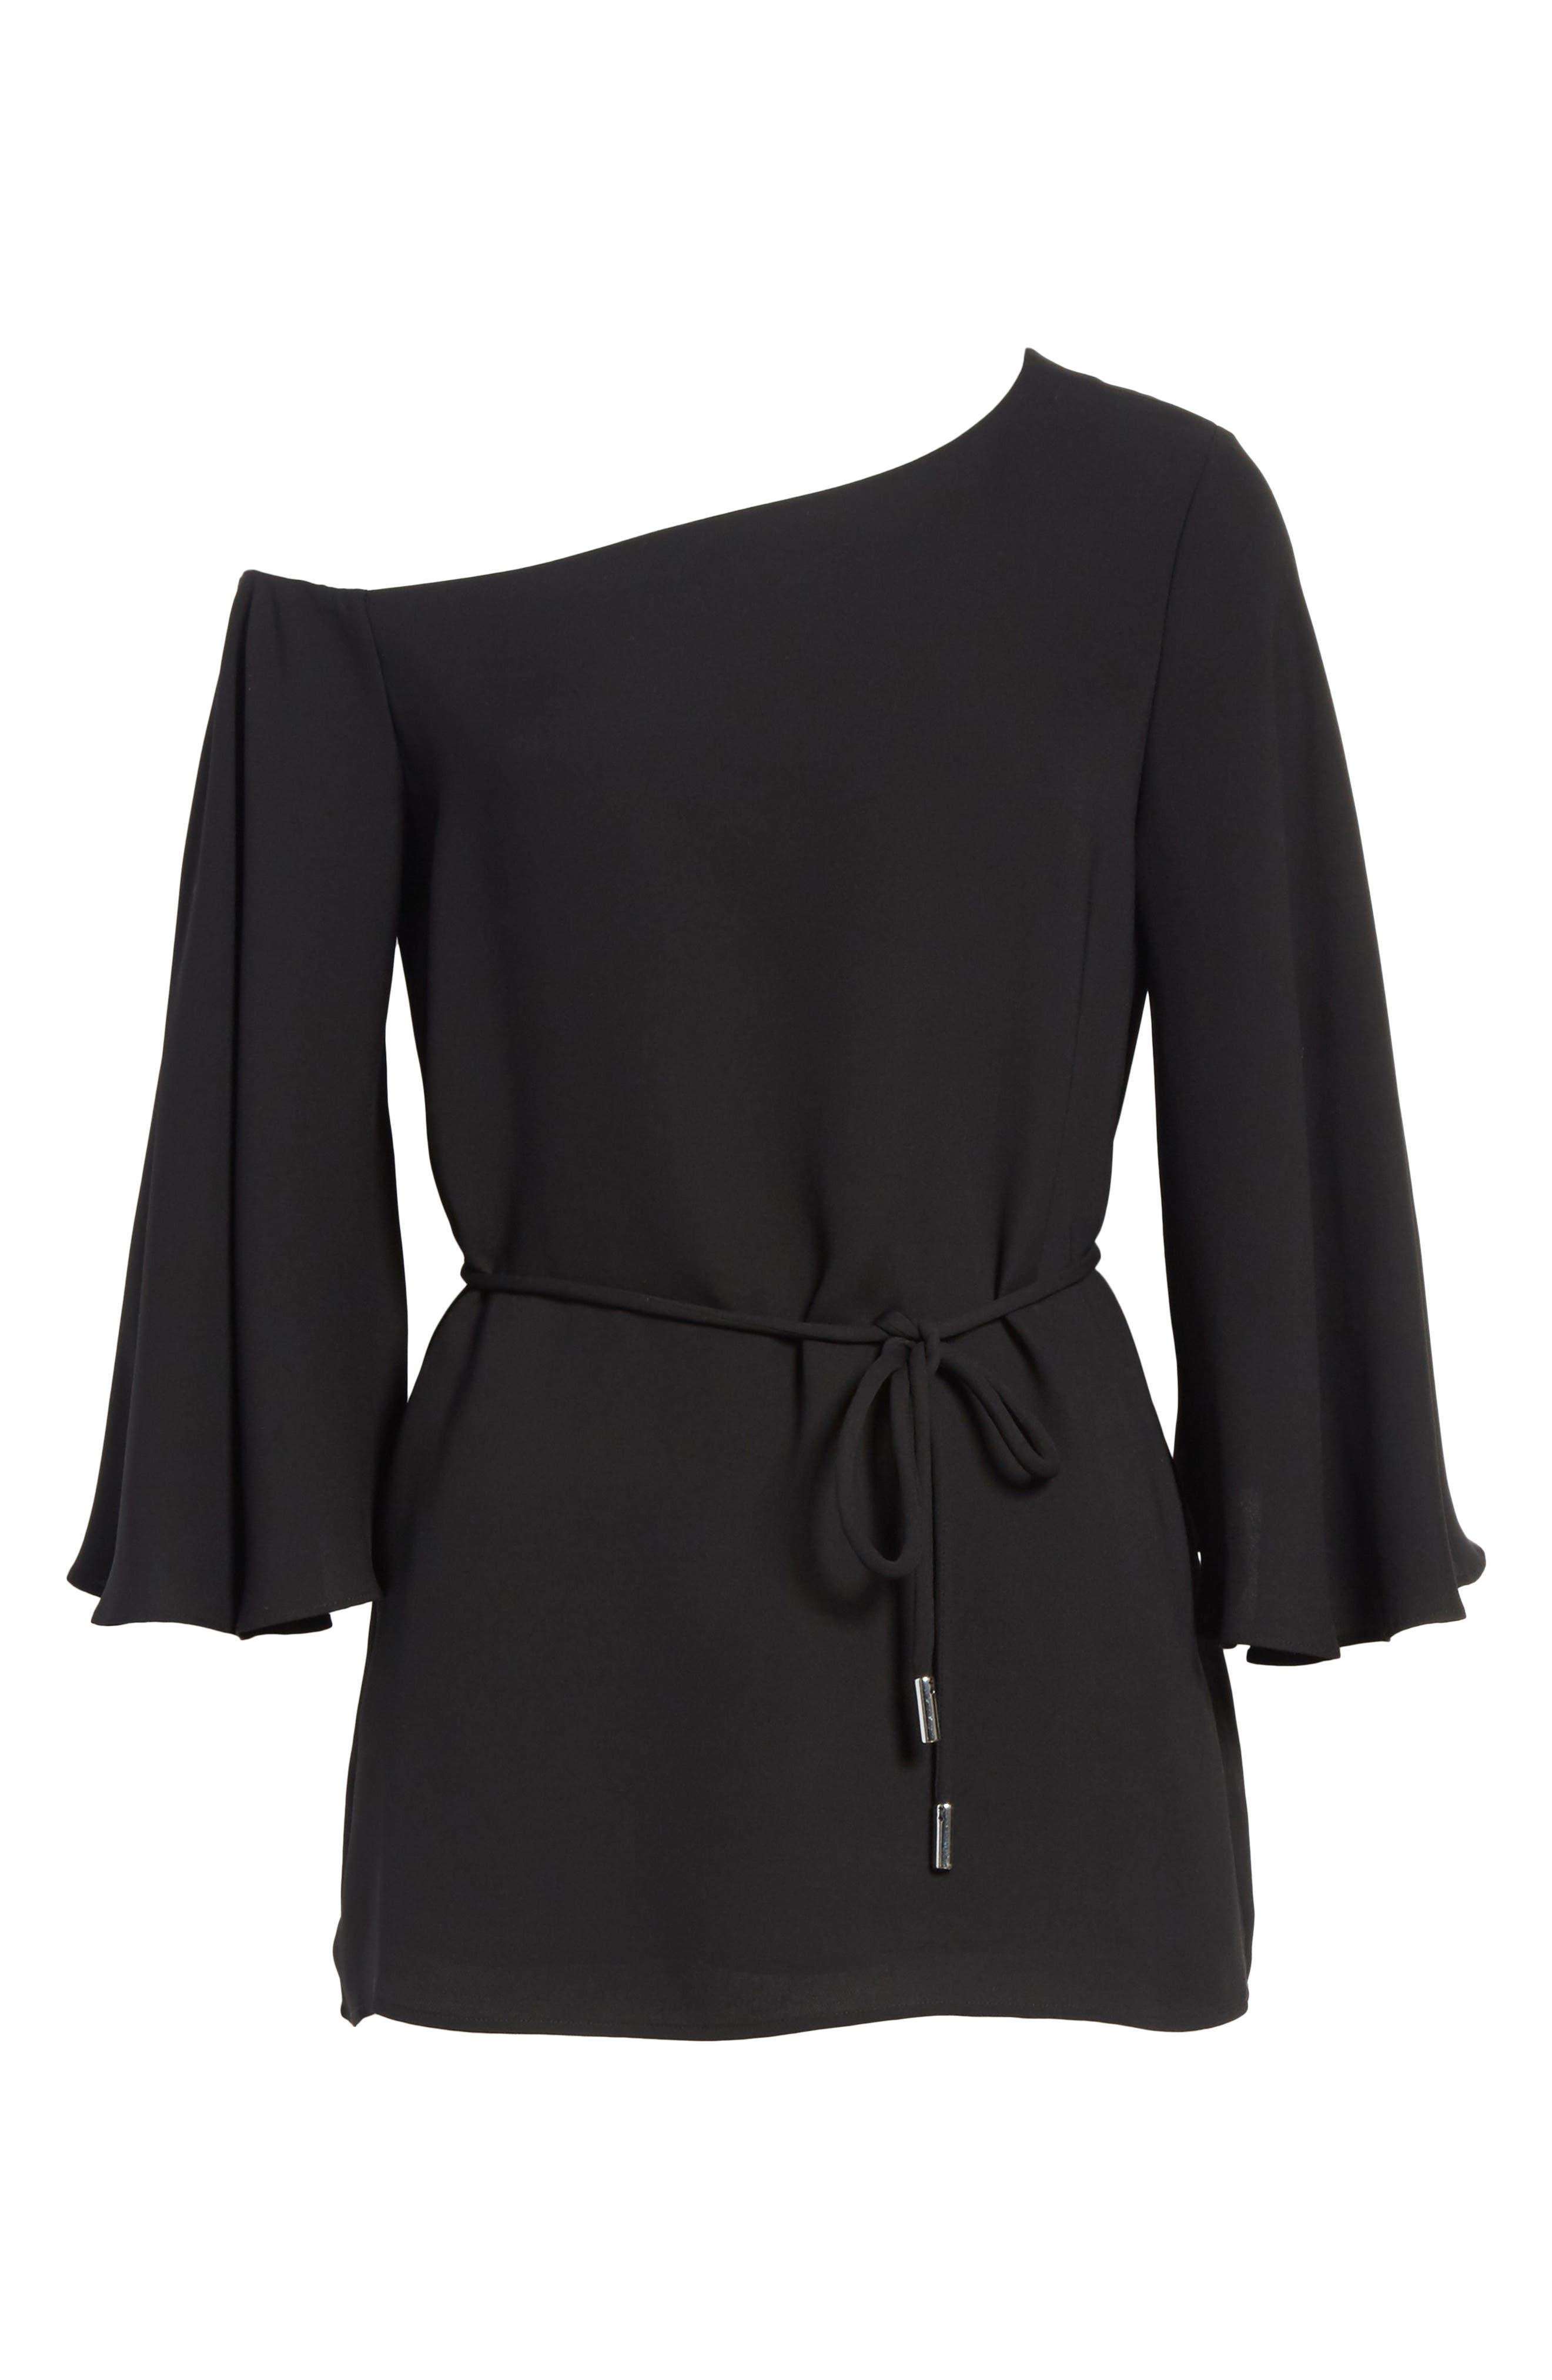 Lara One-Shoulder Tie Silk Top,                             Alternate thumbnail 8, color,                             Black